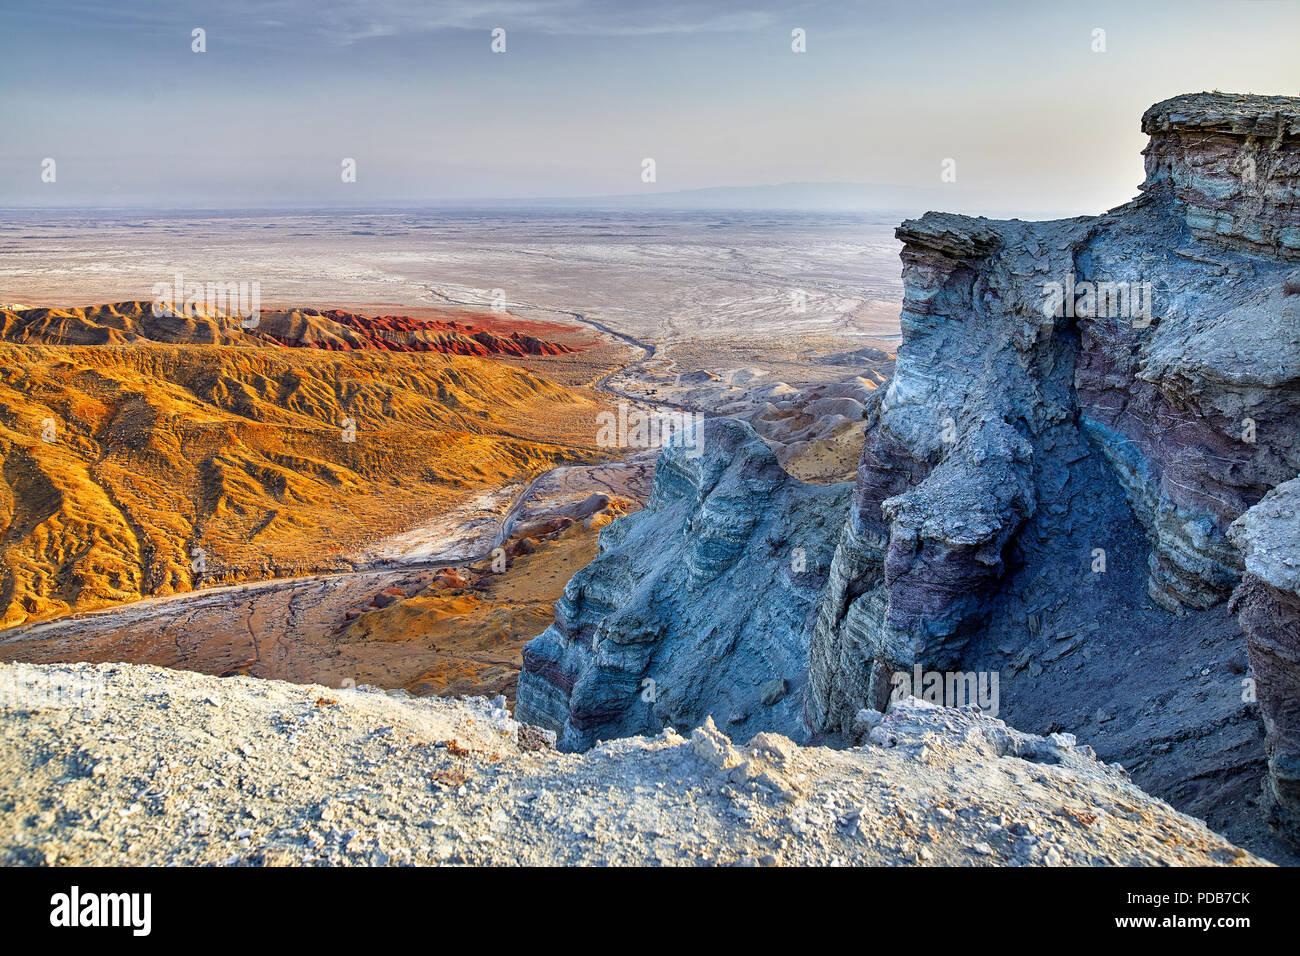 Vista aerea di bizzarre montagne stratificata nel parco deserto Altyn Emel in Kazakistan Foto Stock